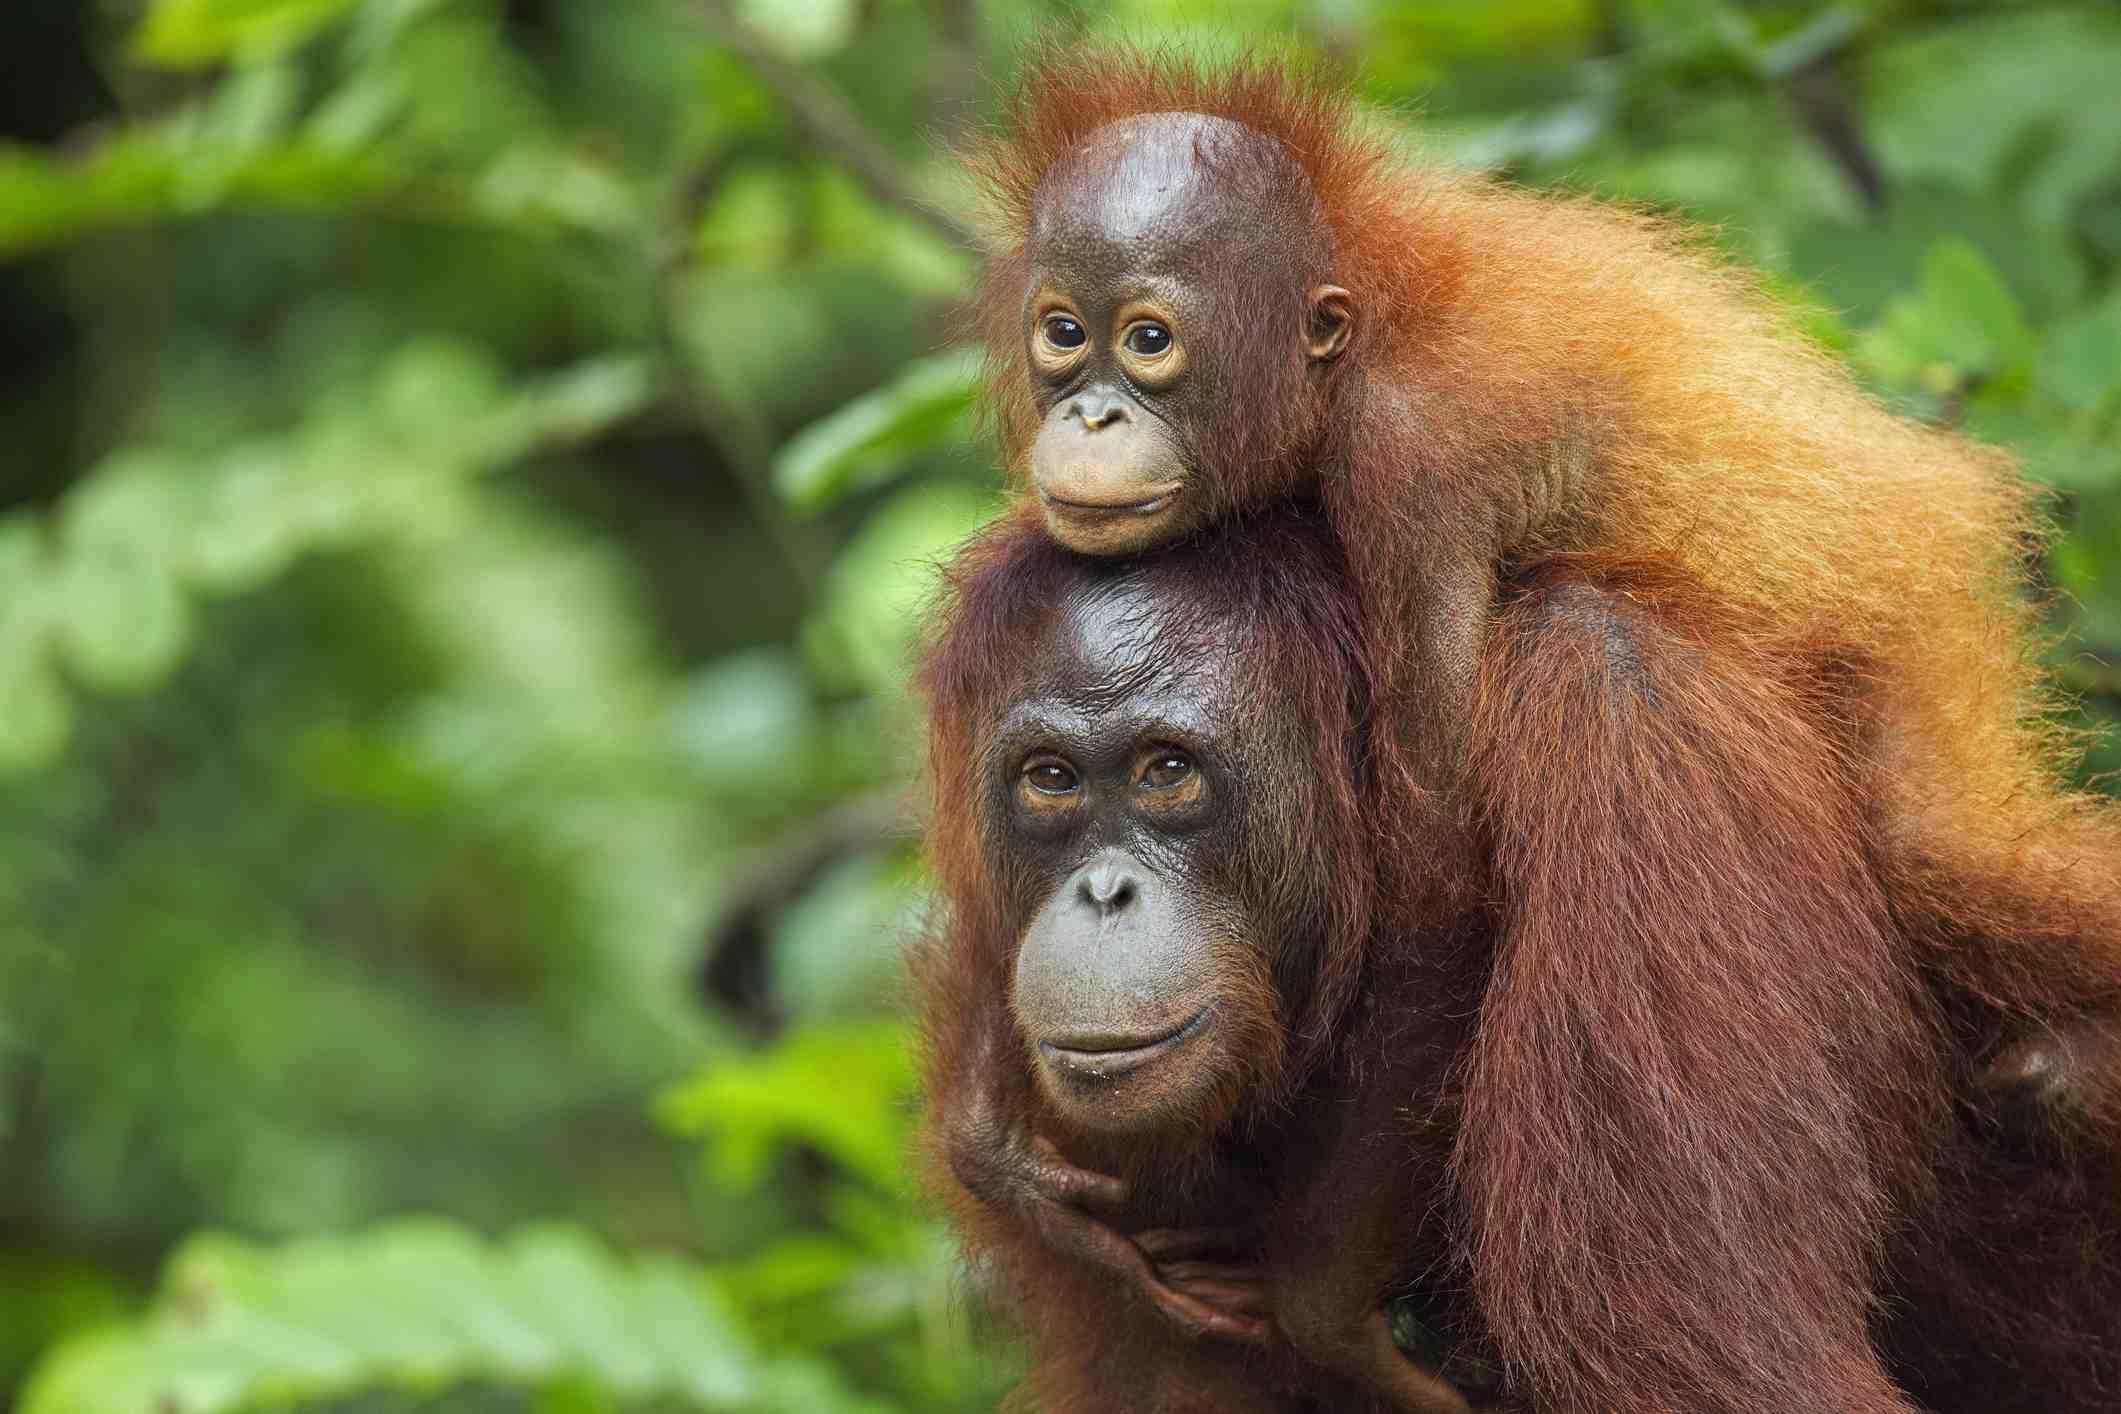 A baby orangutan on a parent orangutan